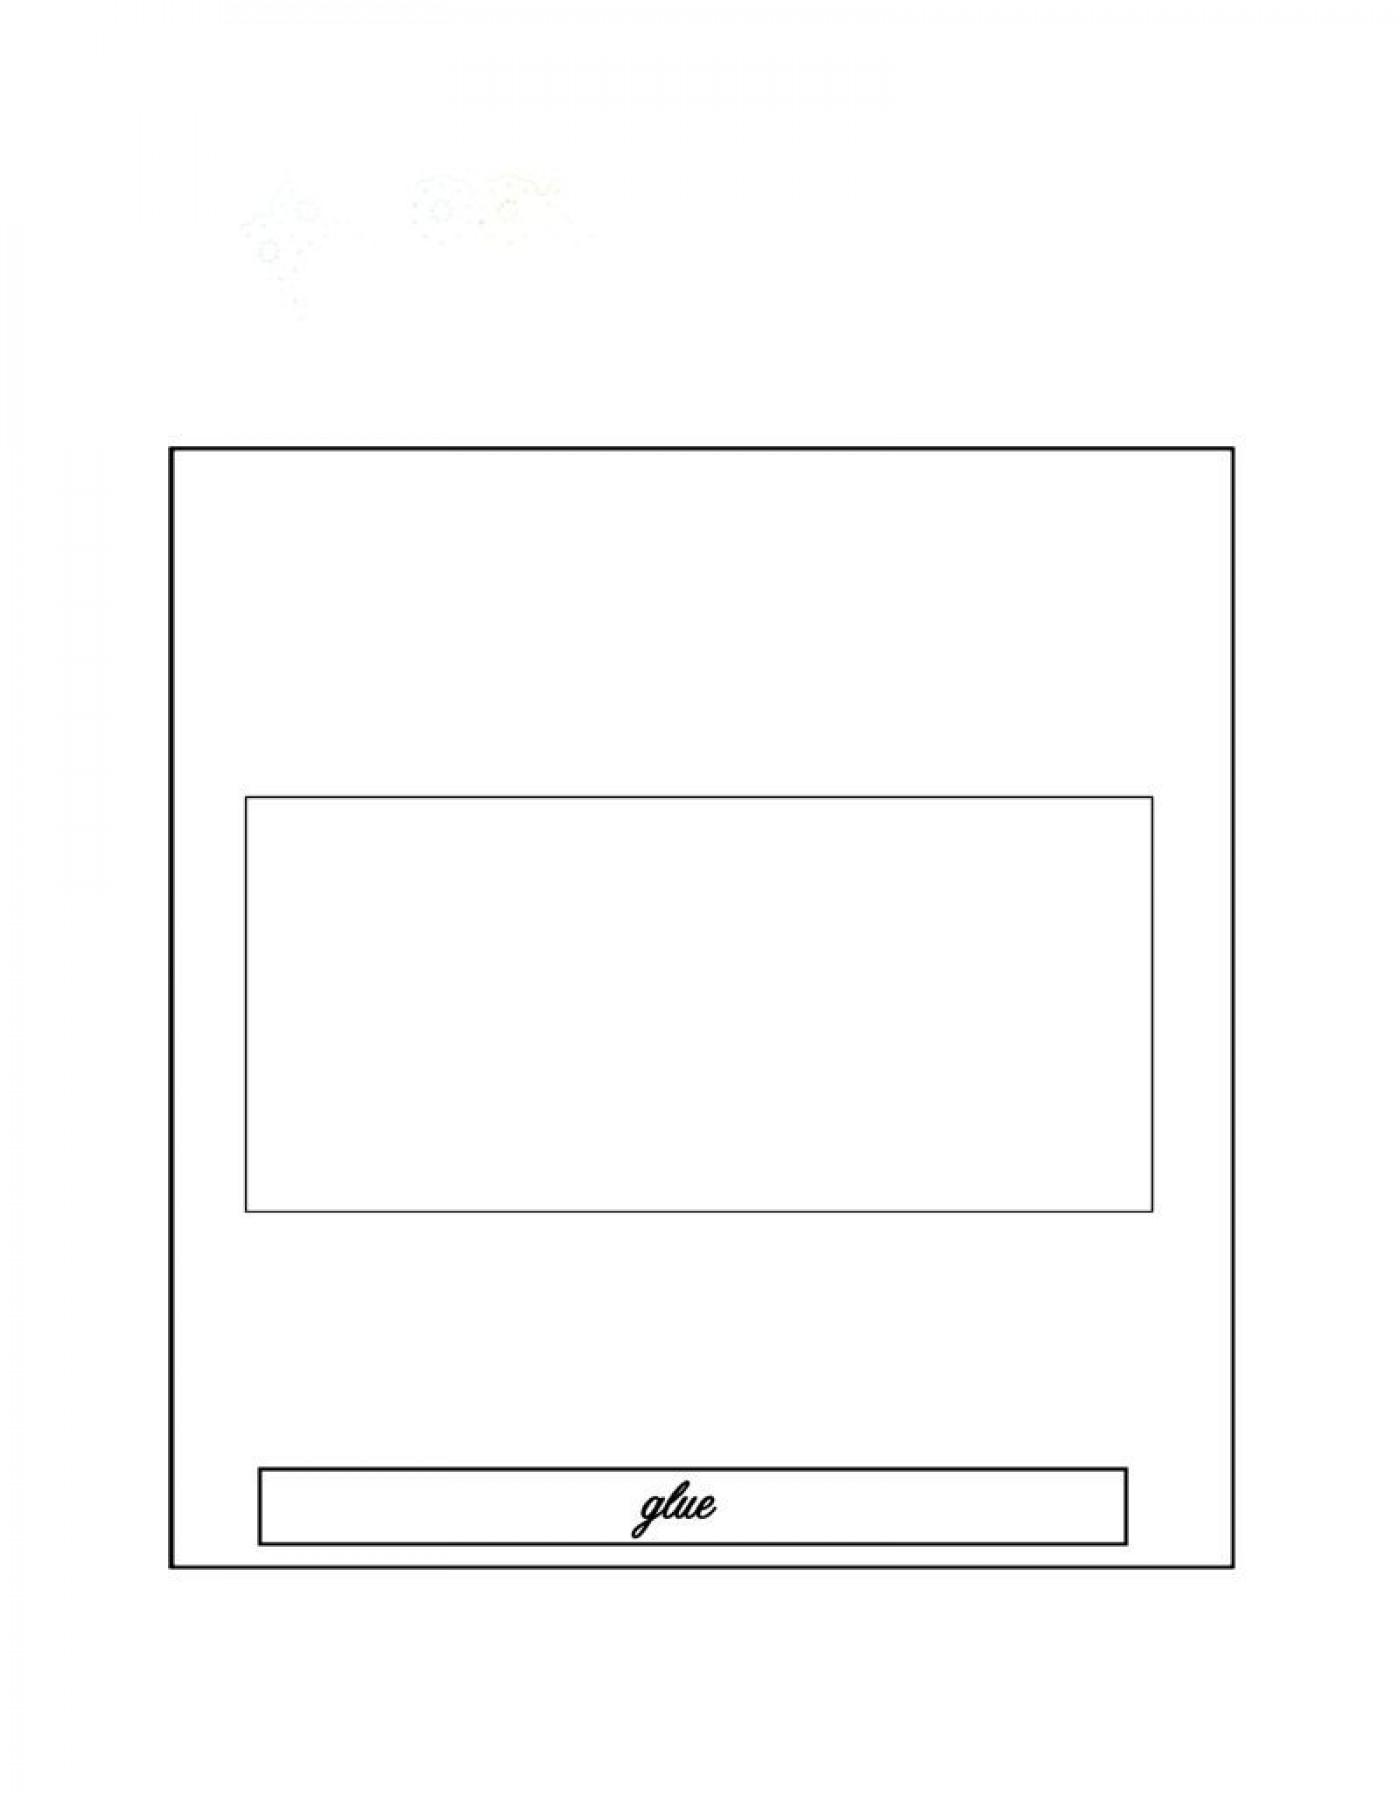 006 Wondrou Candy Bar Wrapper Template Measurement Example  Dimension1400